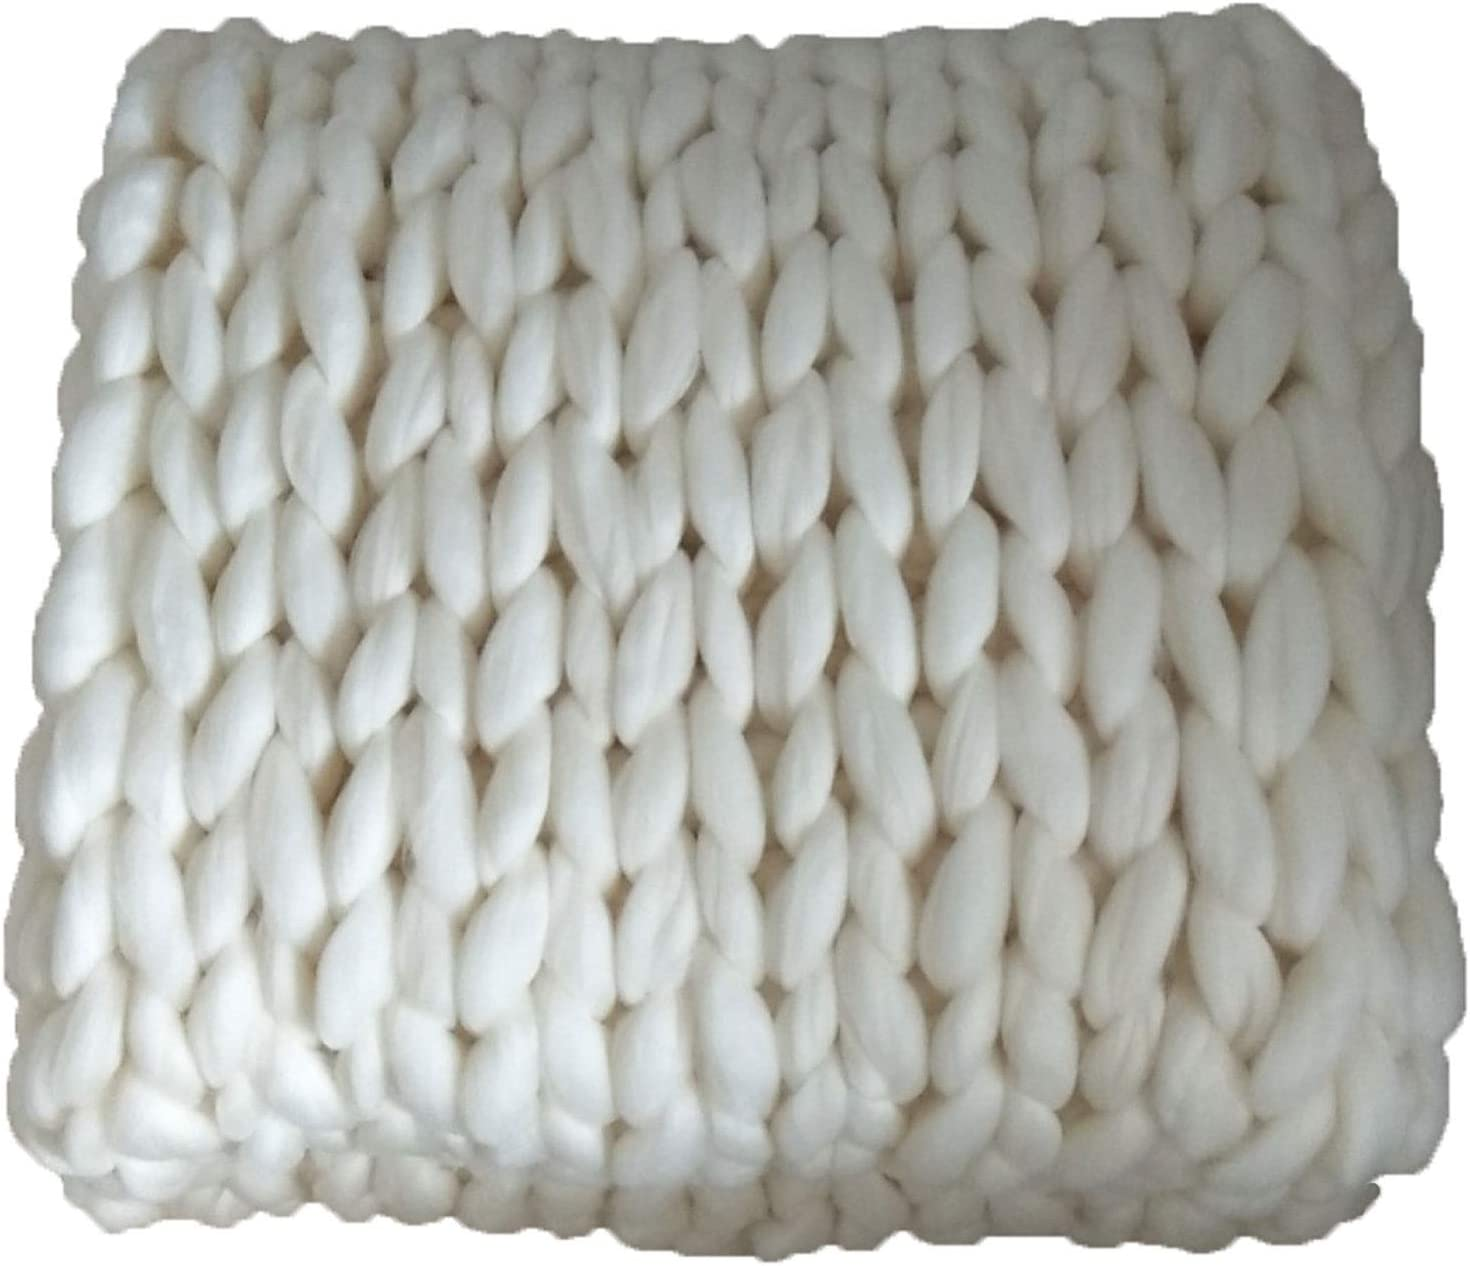 QWERTYUKJ Chunky Popular brand Knit Blanket Merino Throw Wool Yarn Luxury Latest item